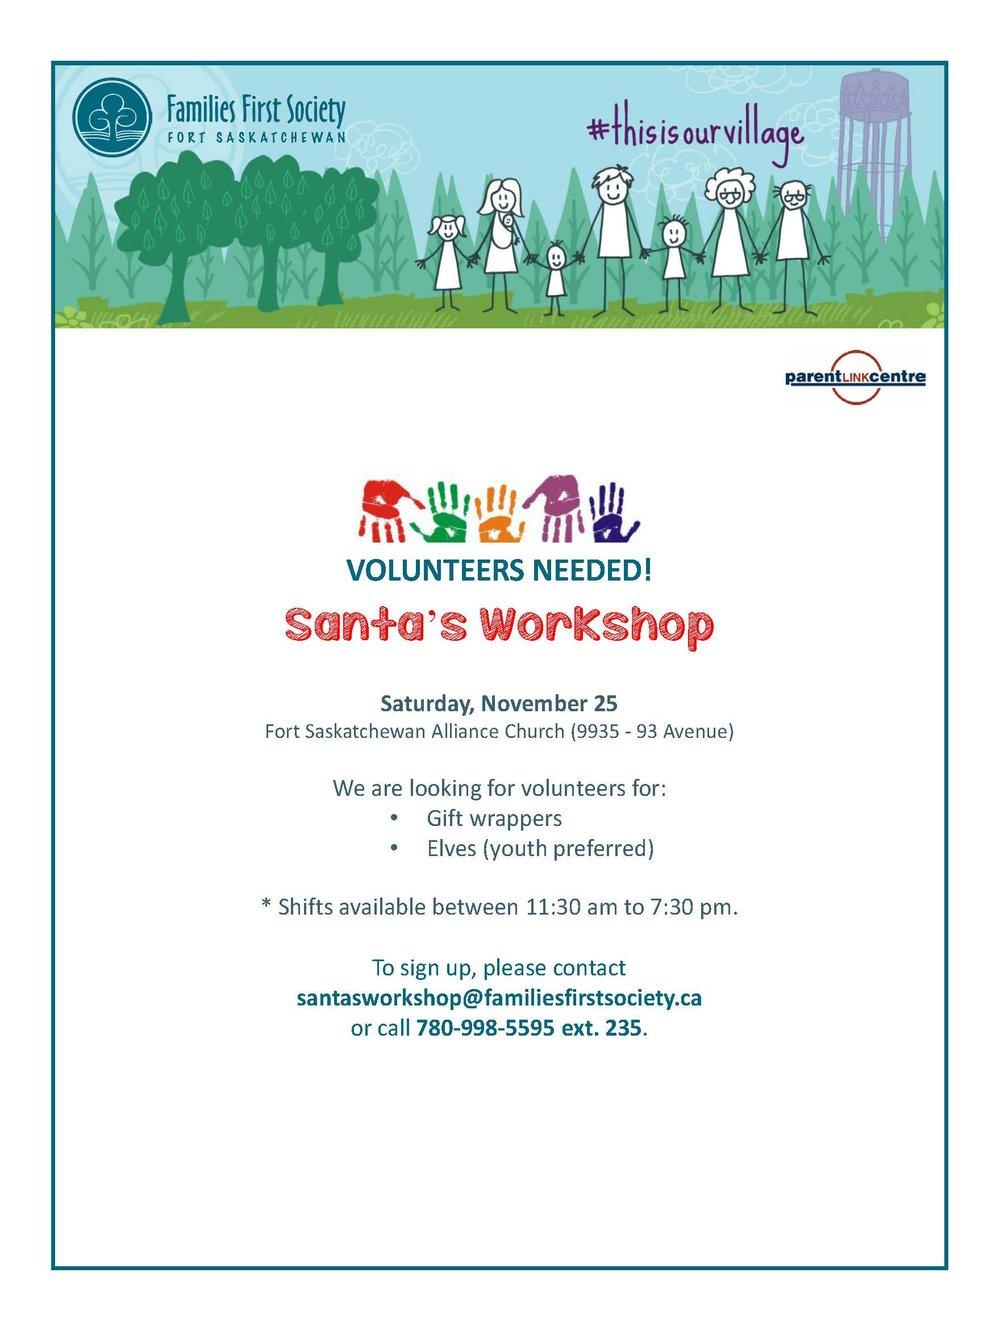 FFS_santasworkshop_volunteerform_2017.jpg